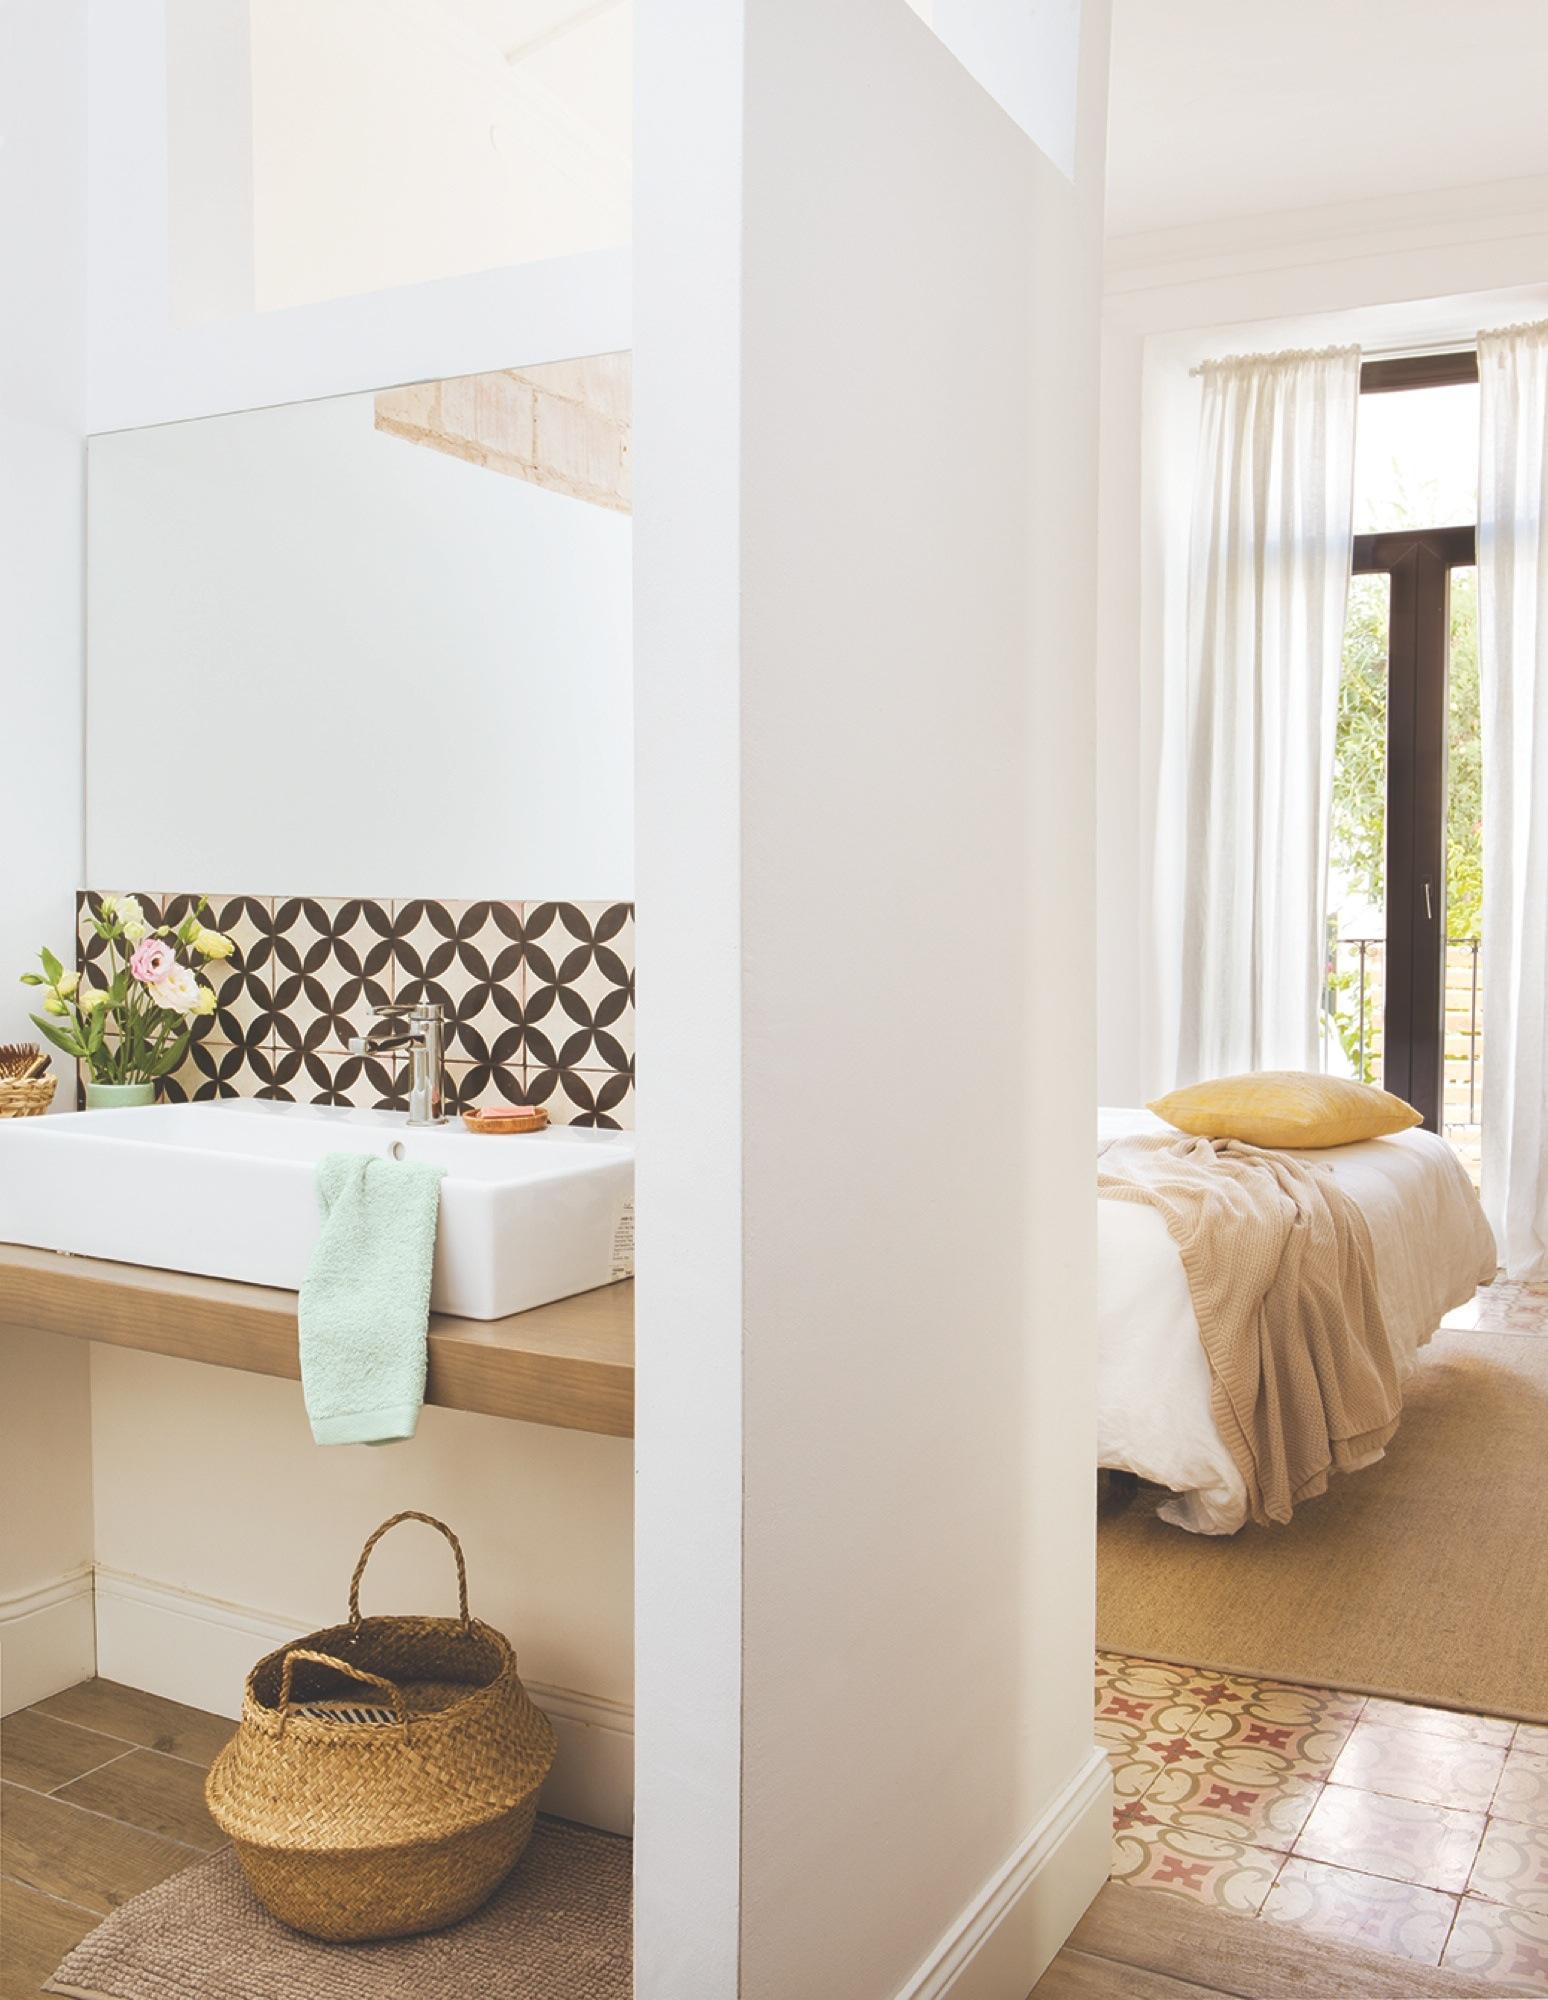 Sofá Soft Rock proyecto de interiorismo Gems Barcelona - baño